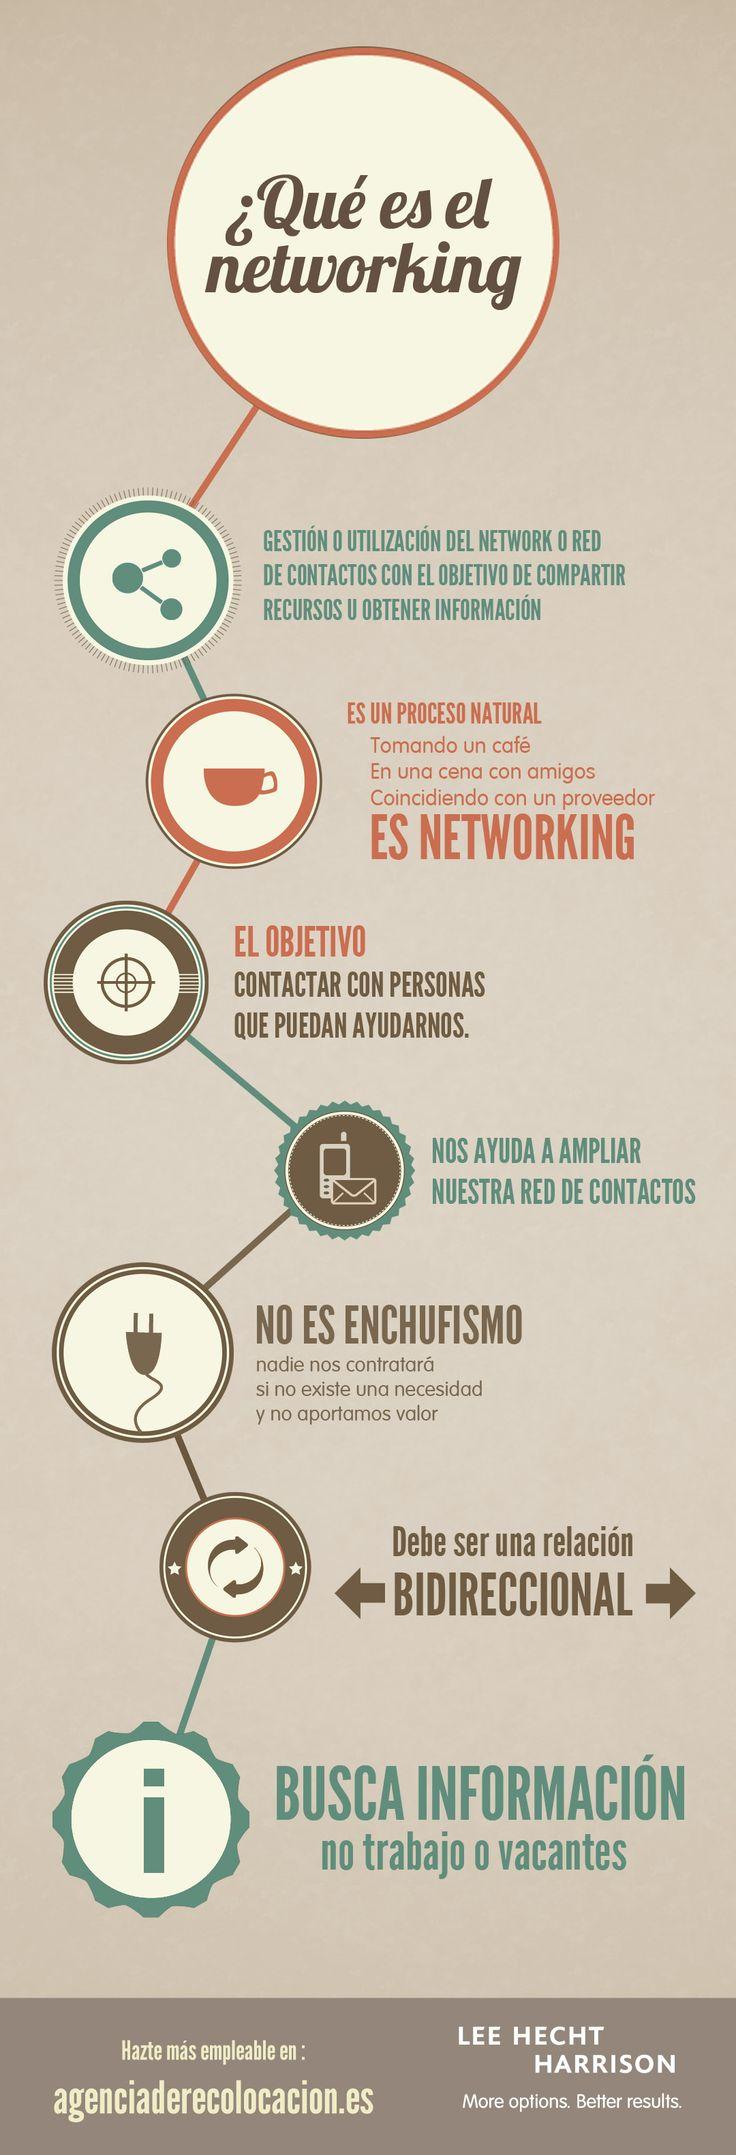 networking.jpg (1080×3163)